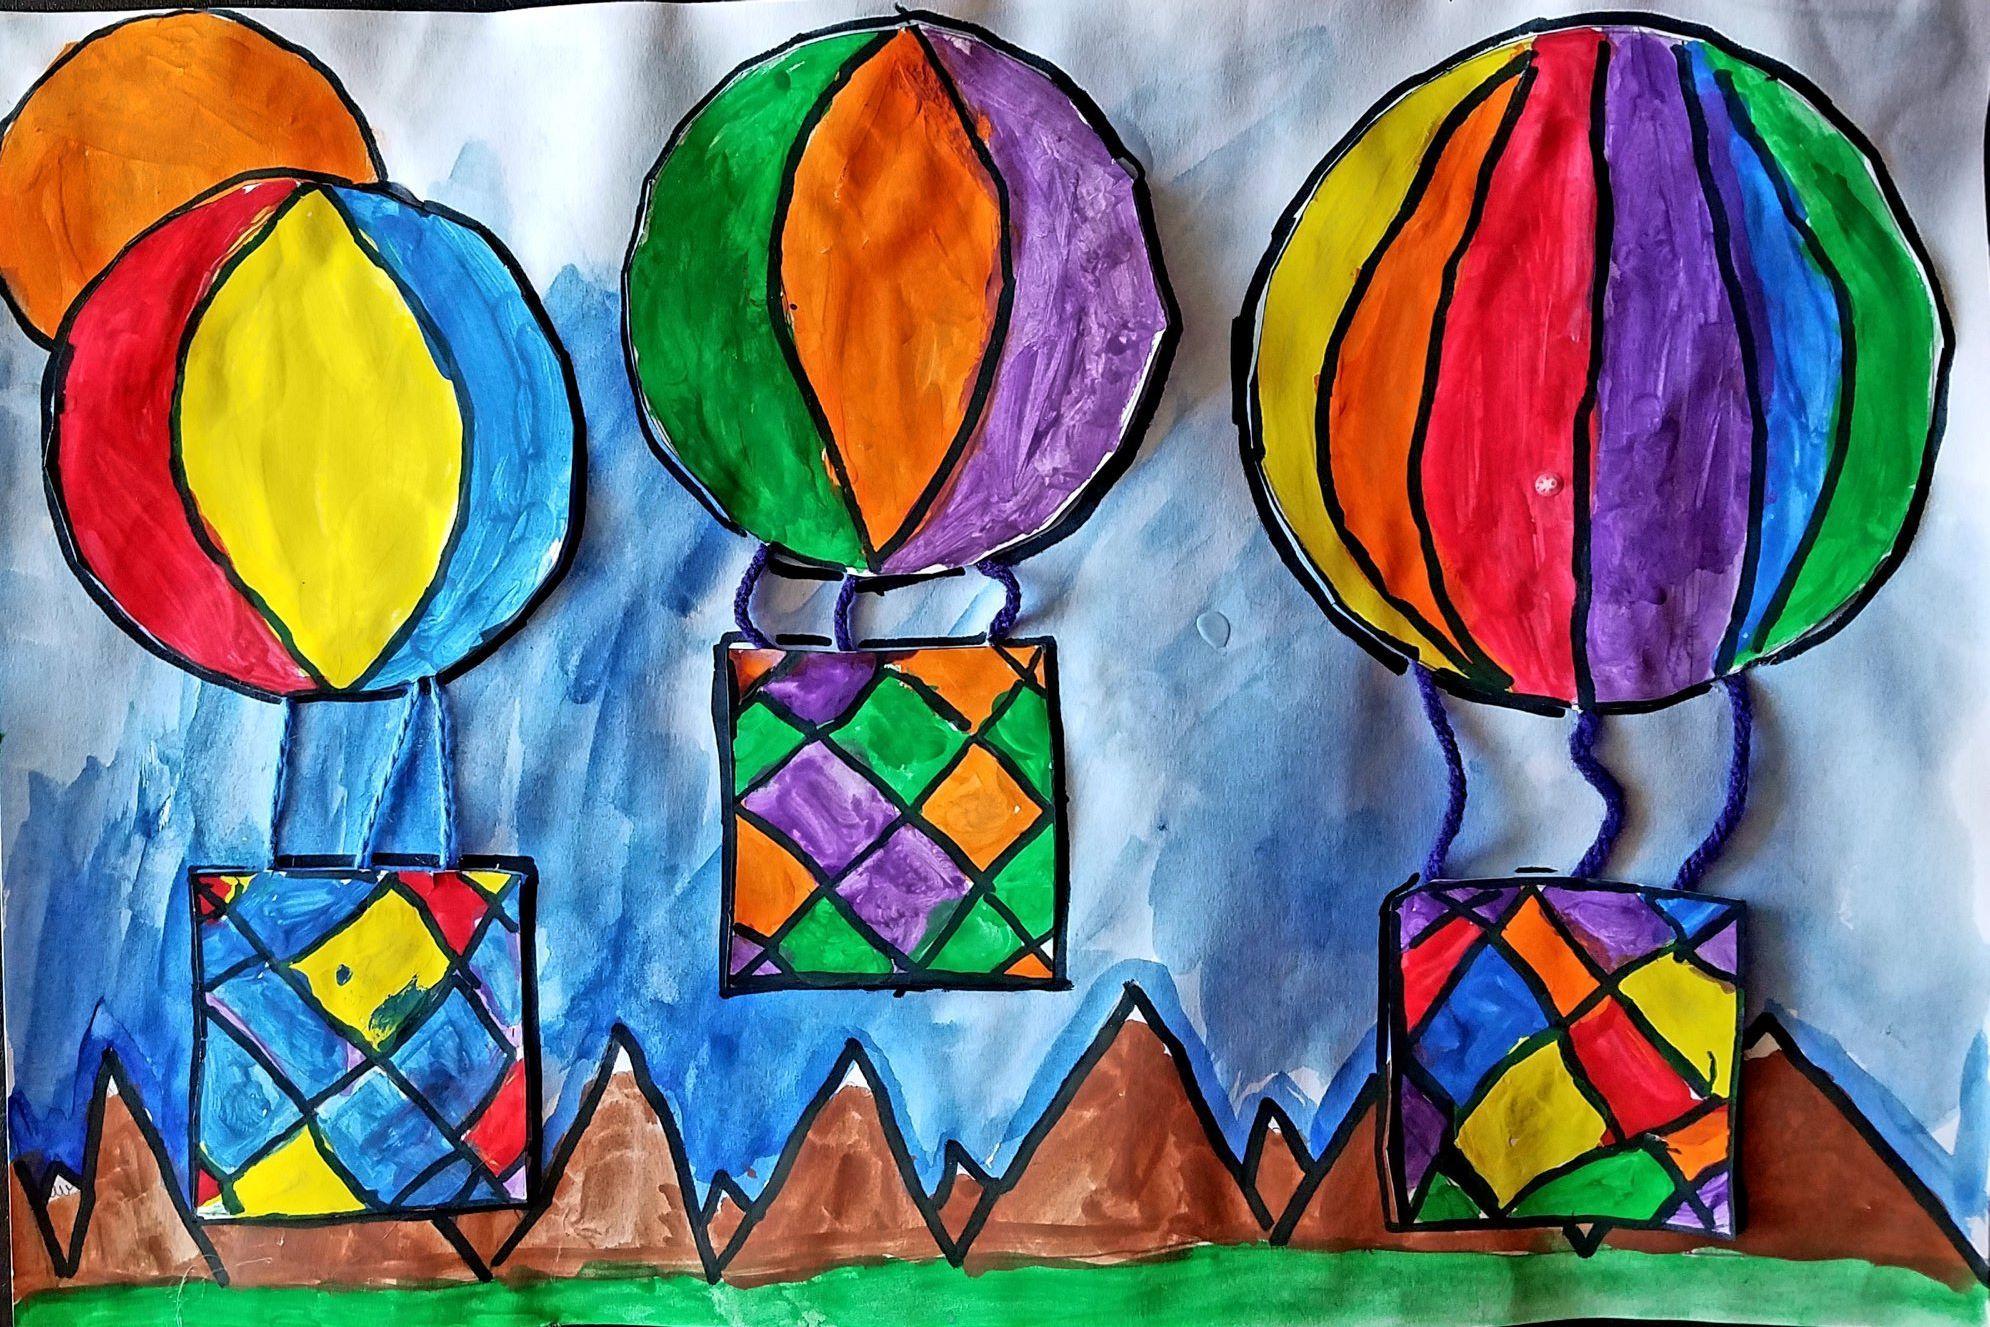 Olivia Z, Jefferson Elementary School, Grade 1, Tempera Paint, Marker, and Yarn, Kim Gremillion